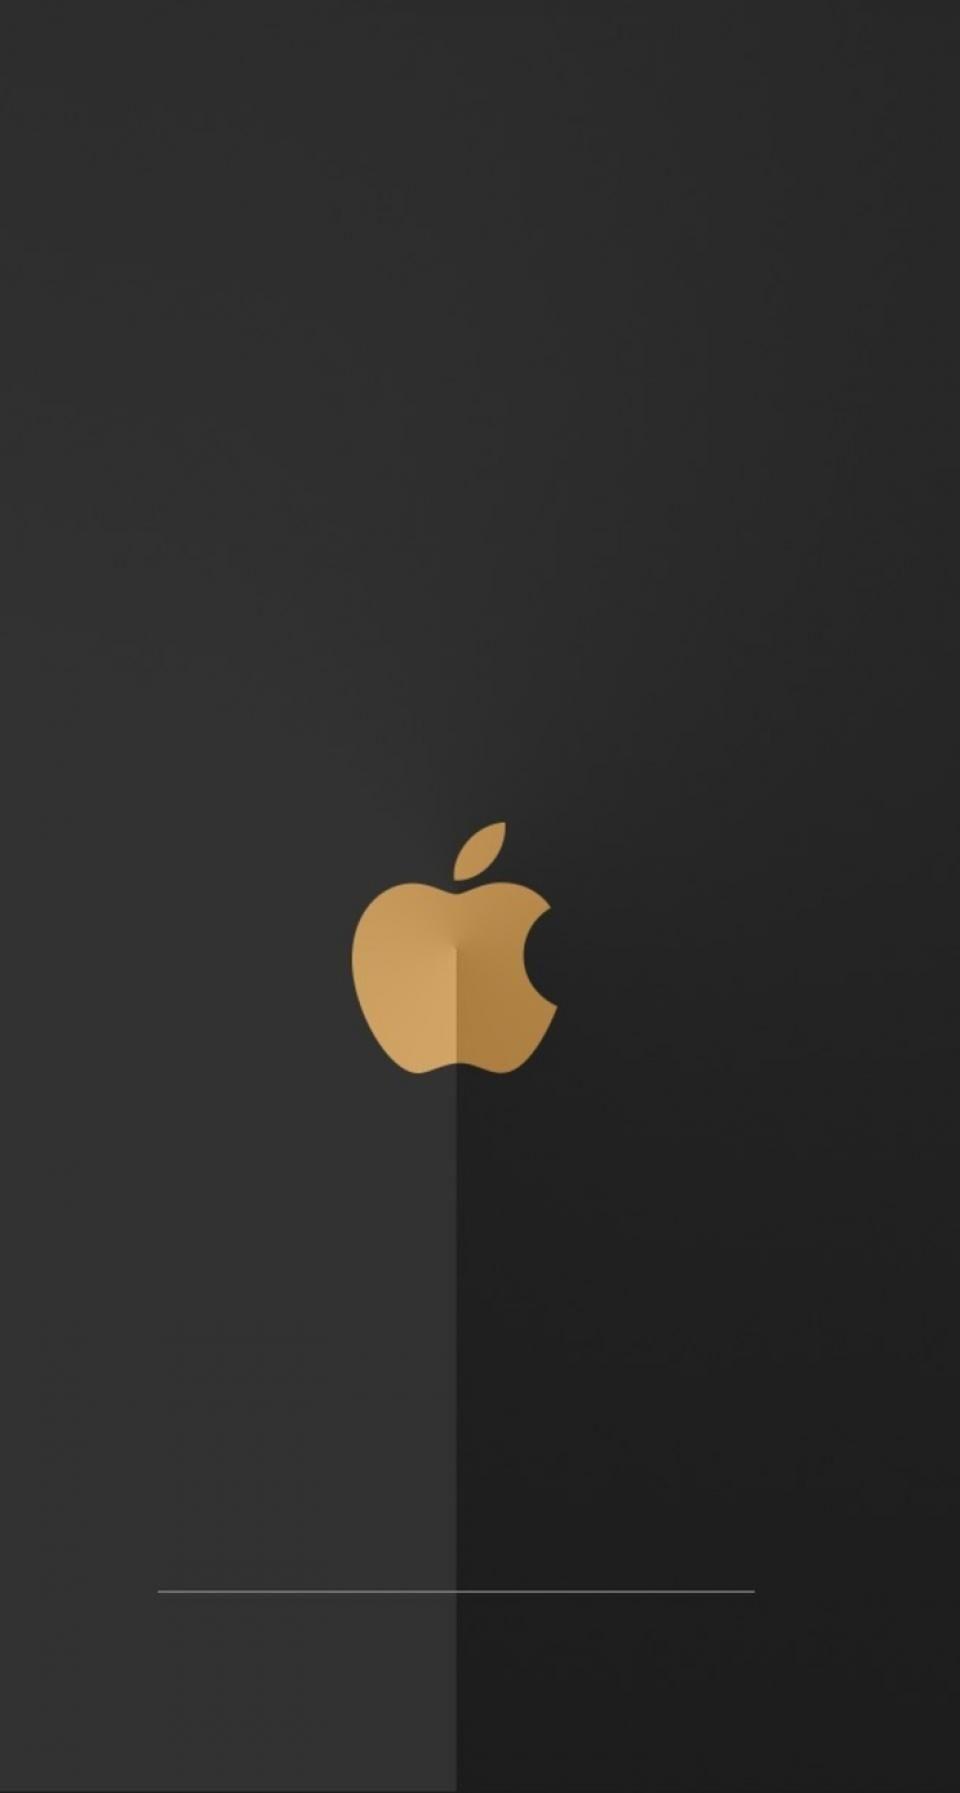 Iphone Retina Hd Dark Wallpapers Top Free Iphone Retina Hd